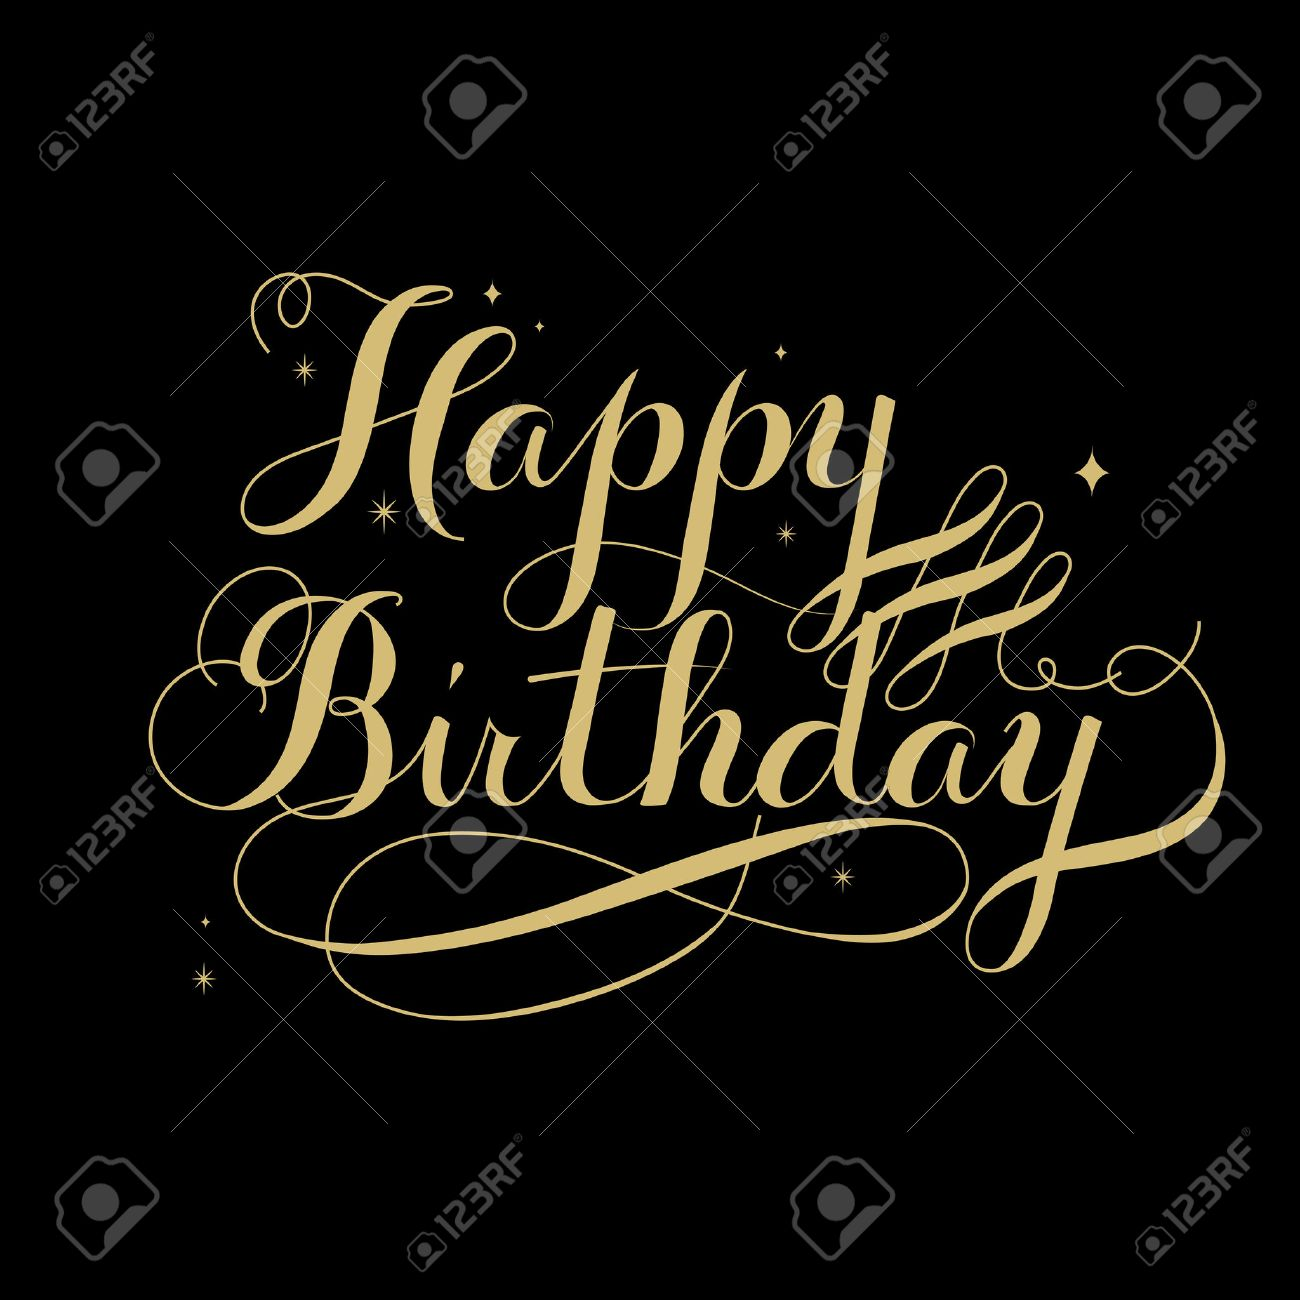 Elegant Happy Birthday Calligraphy Design Over Black Background